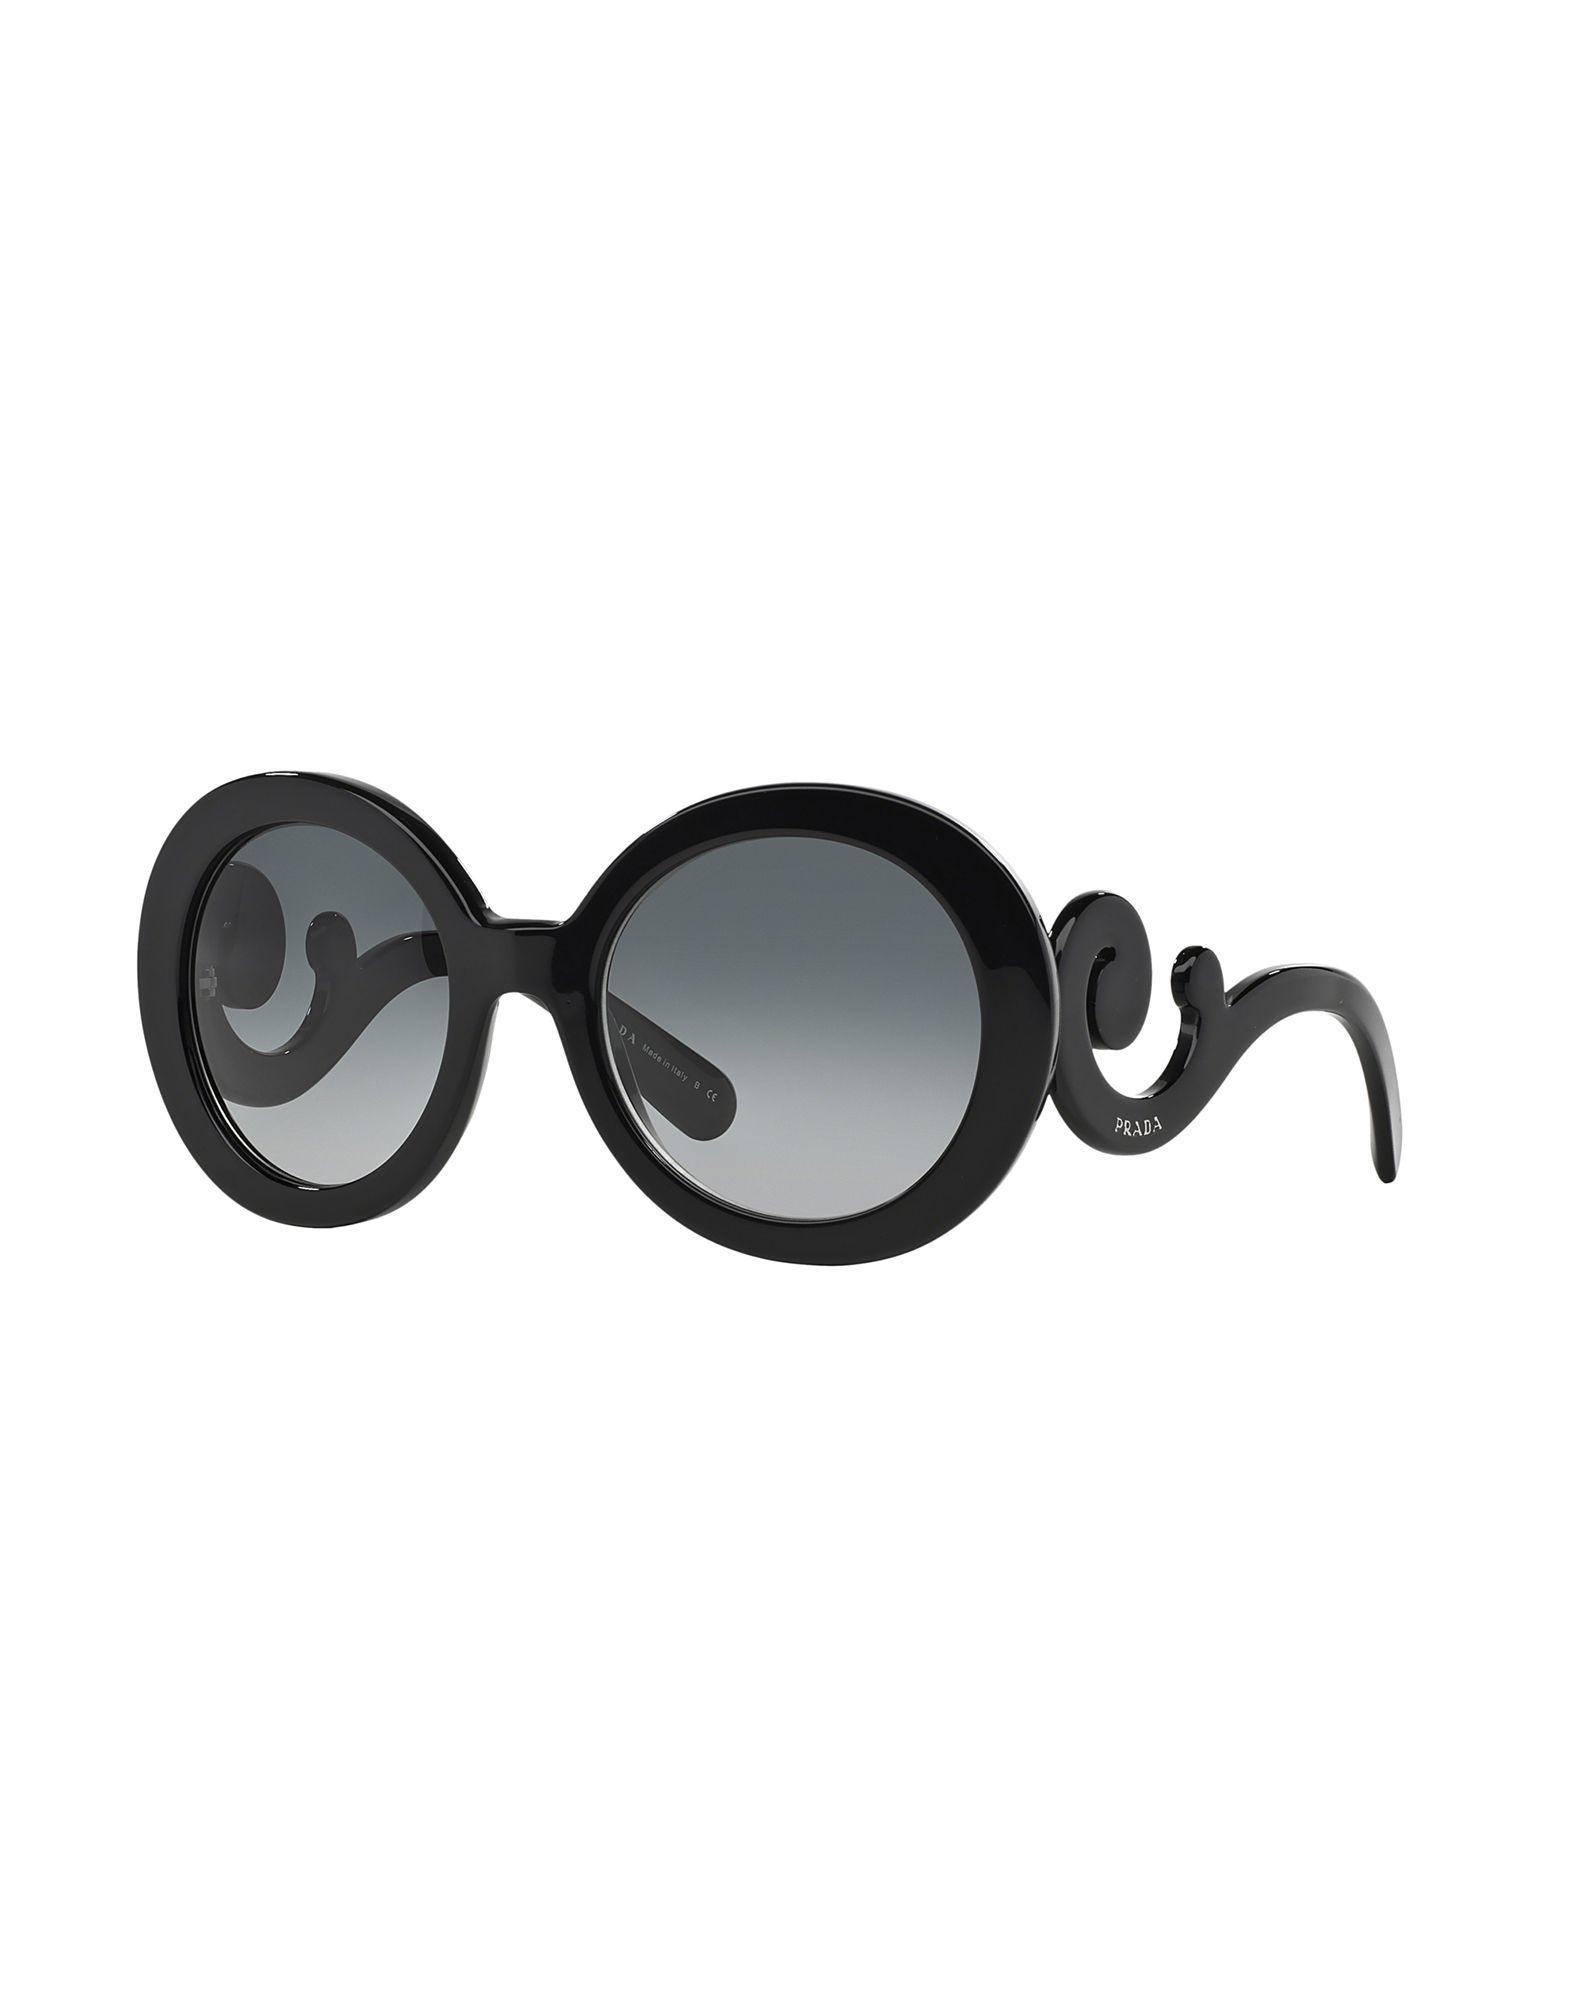 Occhiali Da Sole Prada Donna - Acquista online su